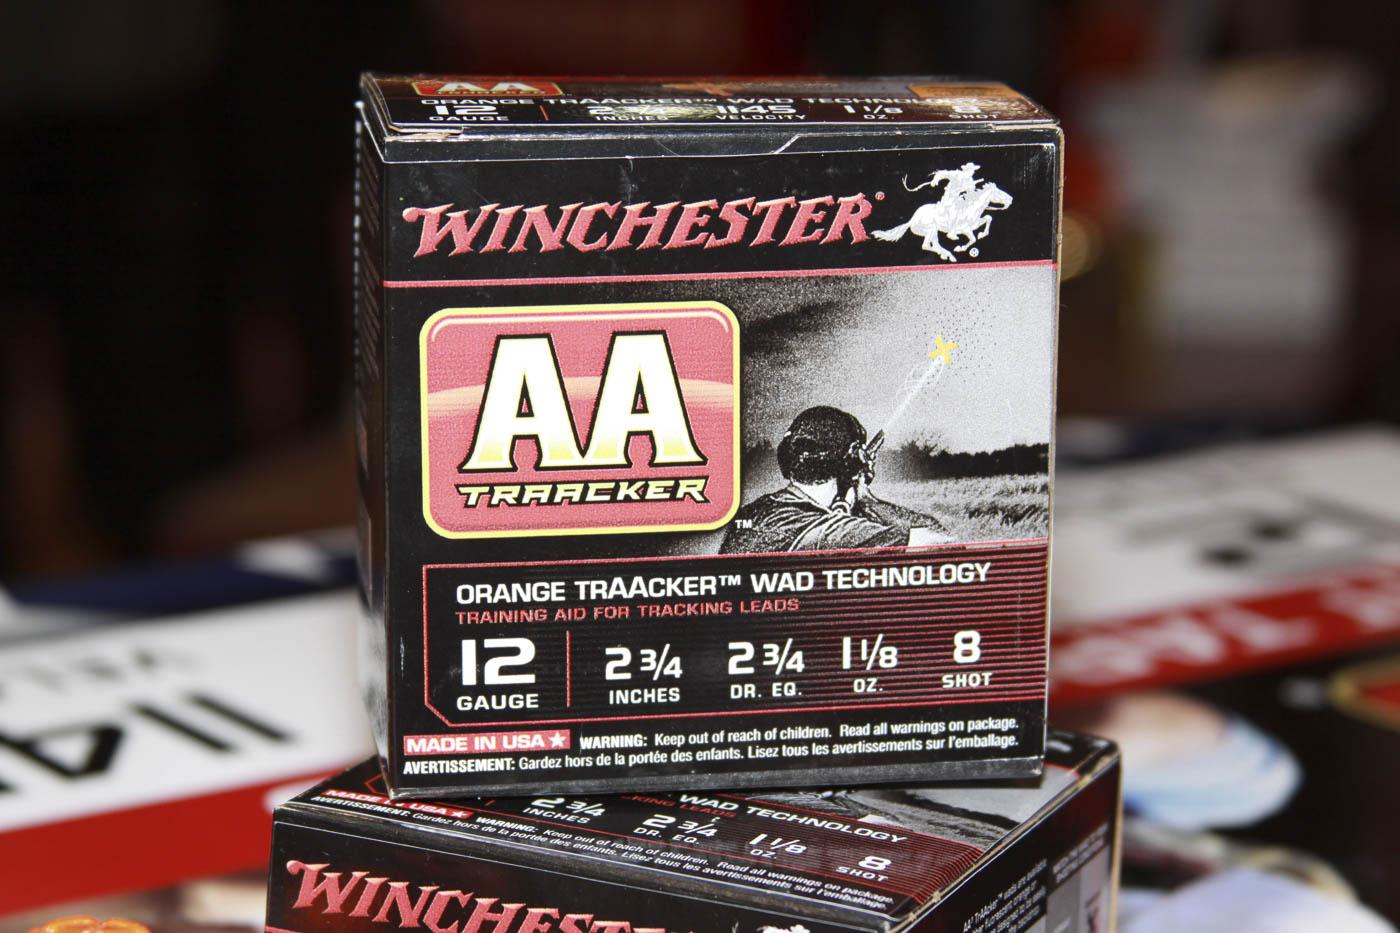 Winchester AA TrAAcker 12 gauge shotgun ammo box